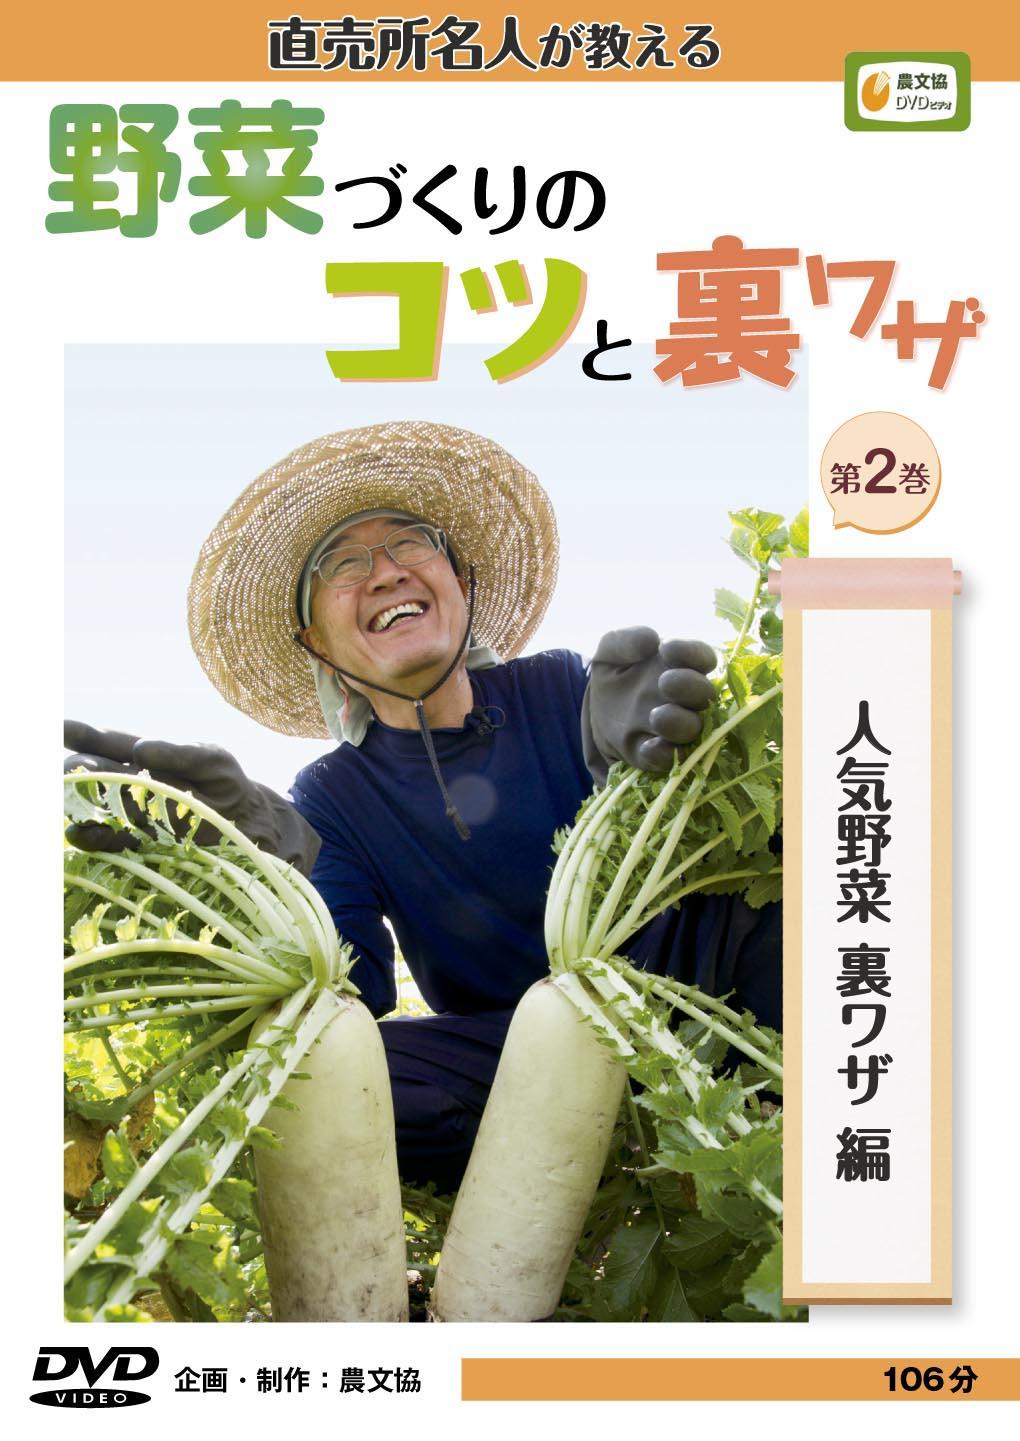 DVD 野菜づくりのコツと裏ワザNo.2 人気野菜裏ワザ編